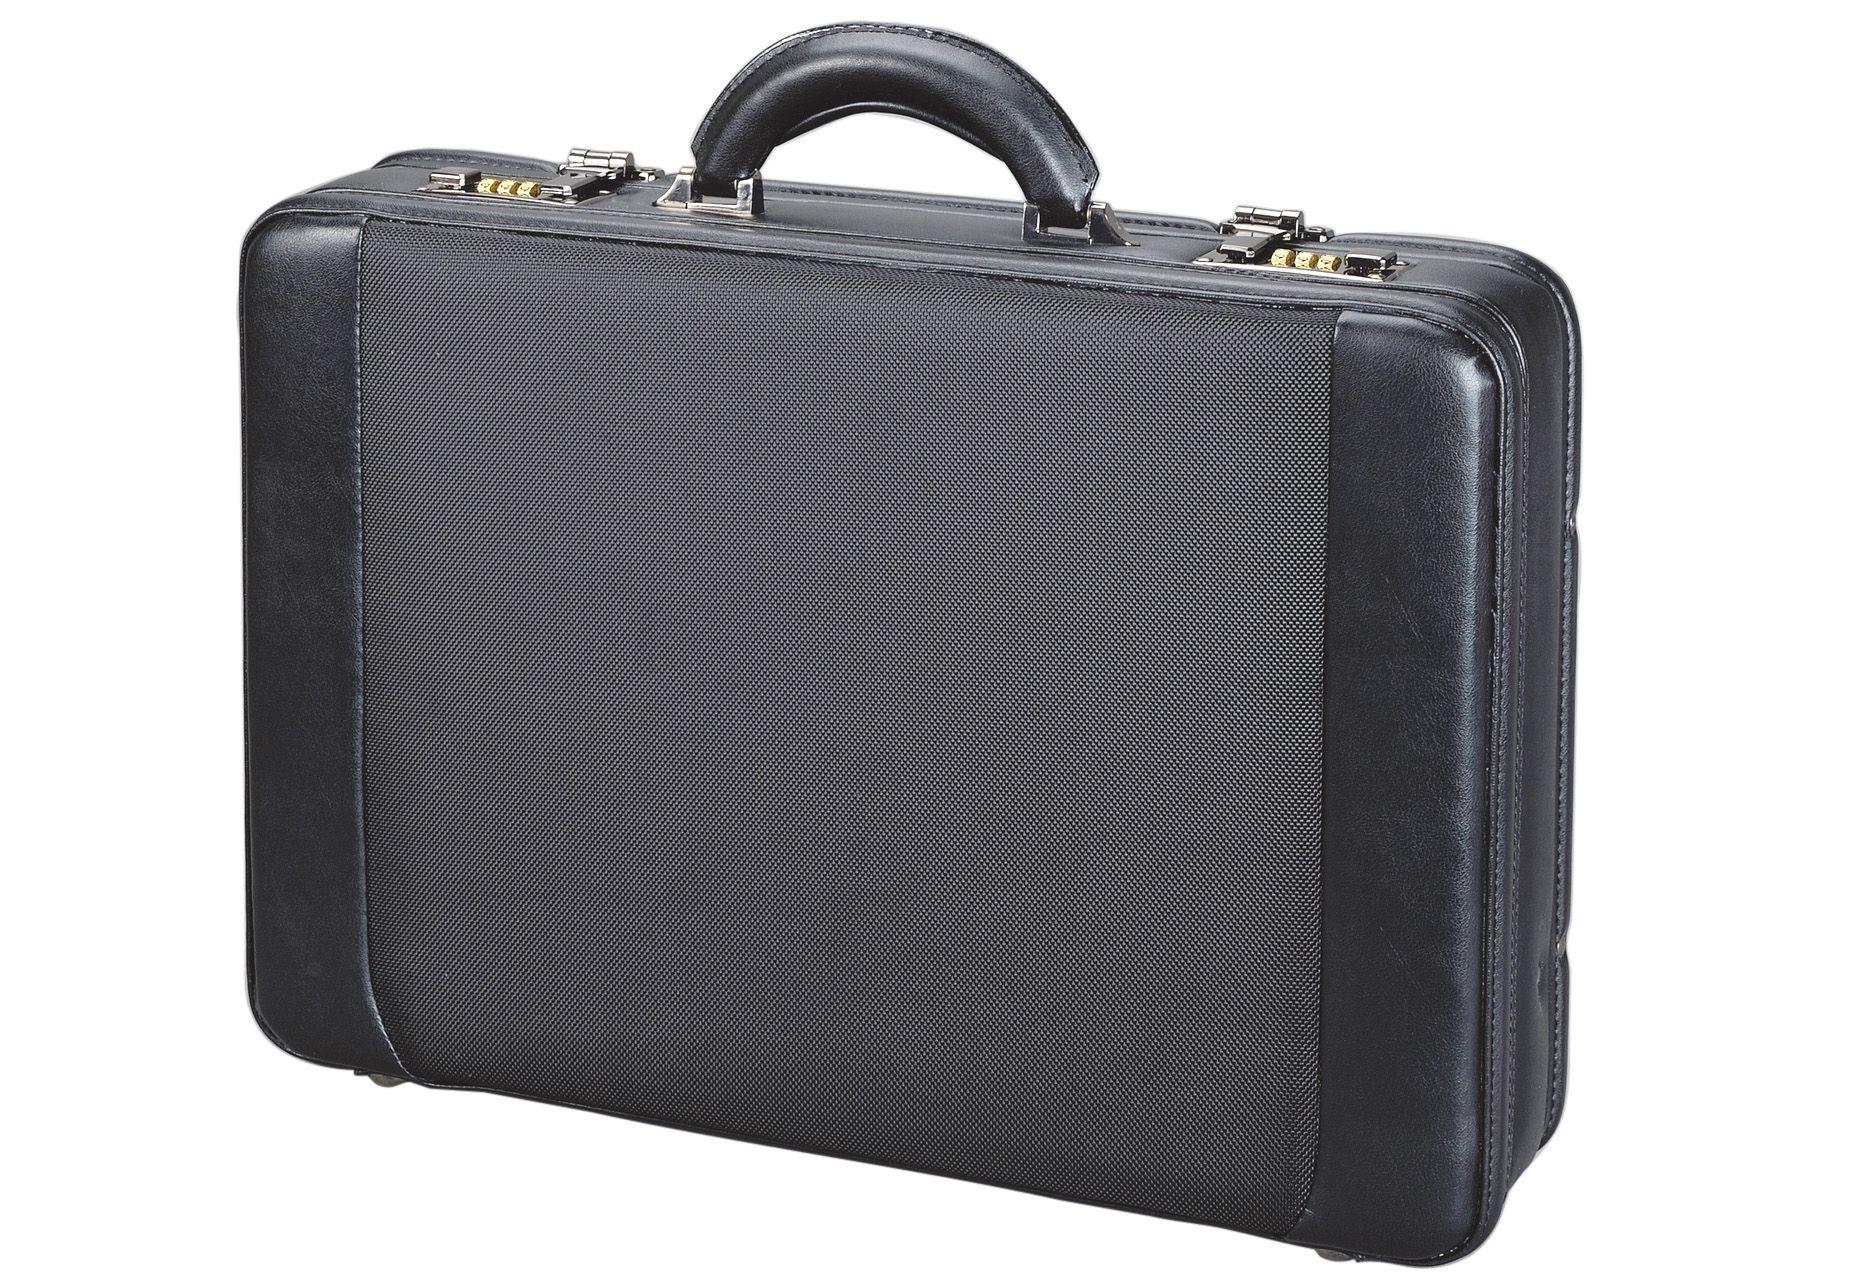 ALASSIO® Alassio® Businesskoffer mit herausnehmbarer Laptoptasche, »Modica, Attachékoffer«